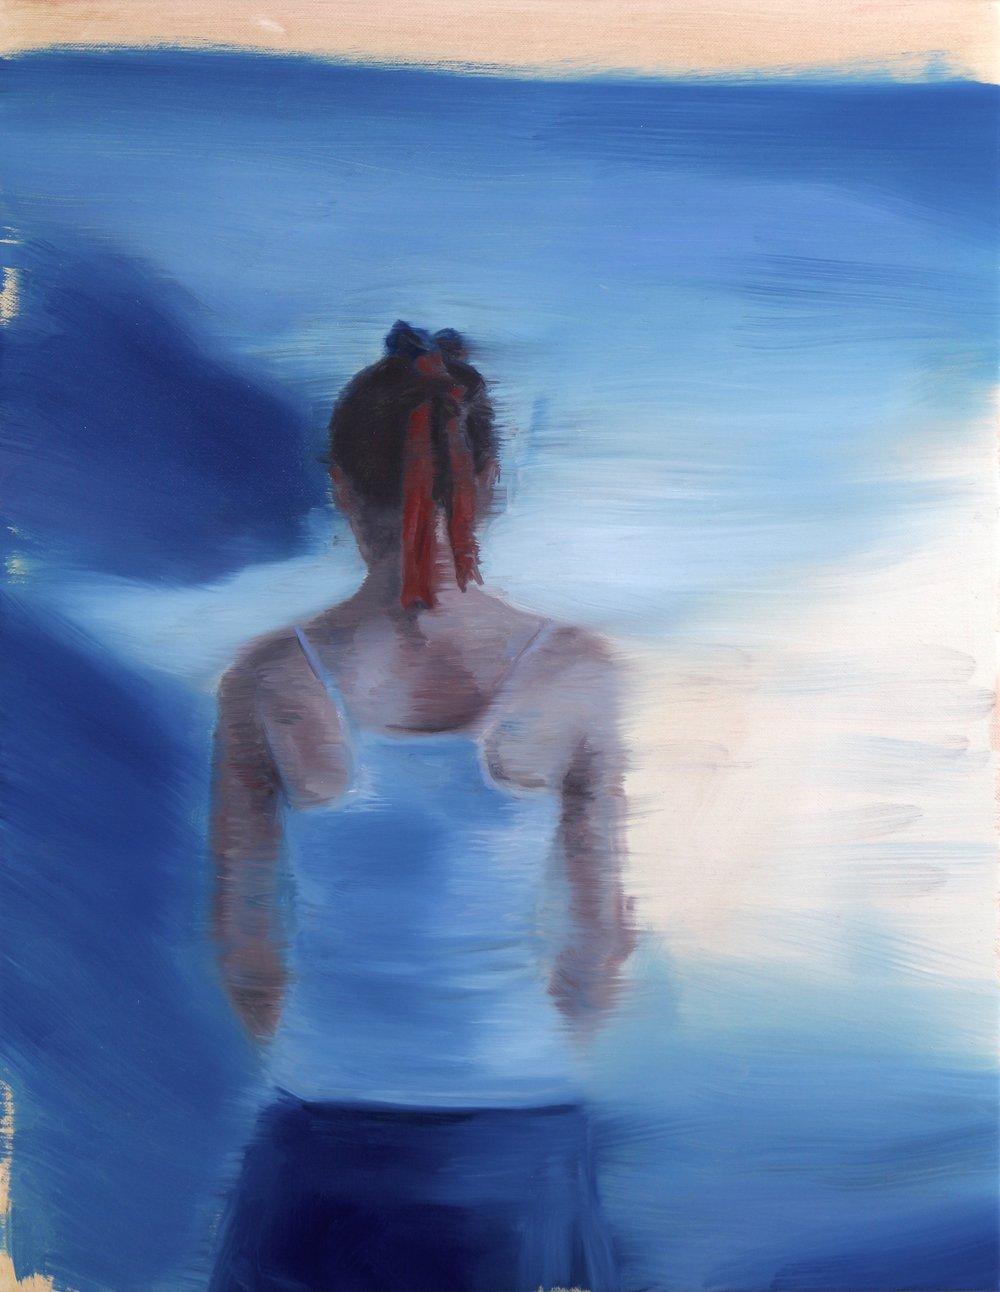 The Blue Screen, Oil on linen, 45x35cm, 2017